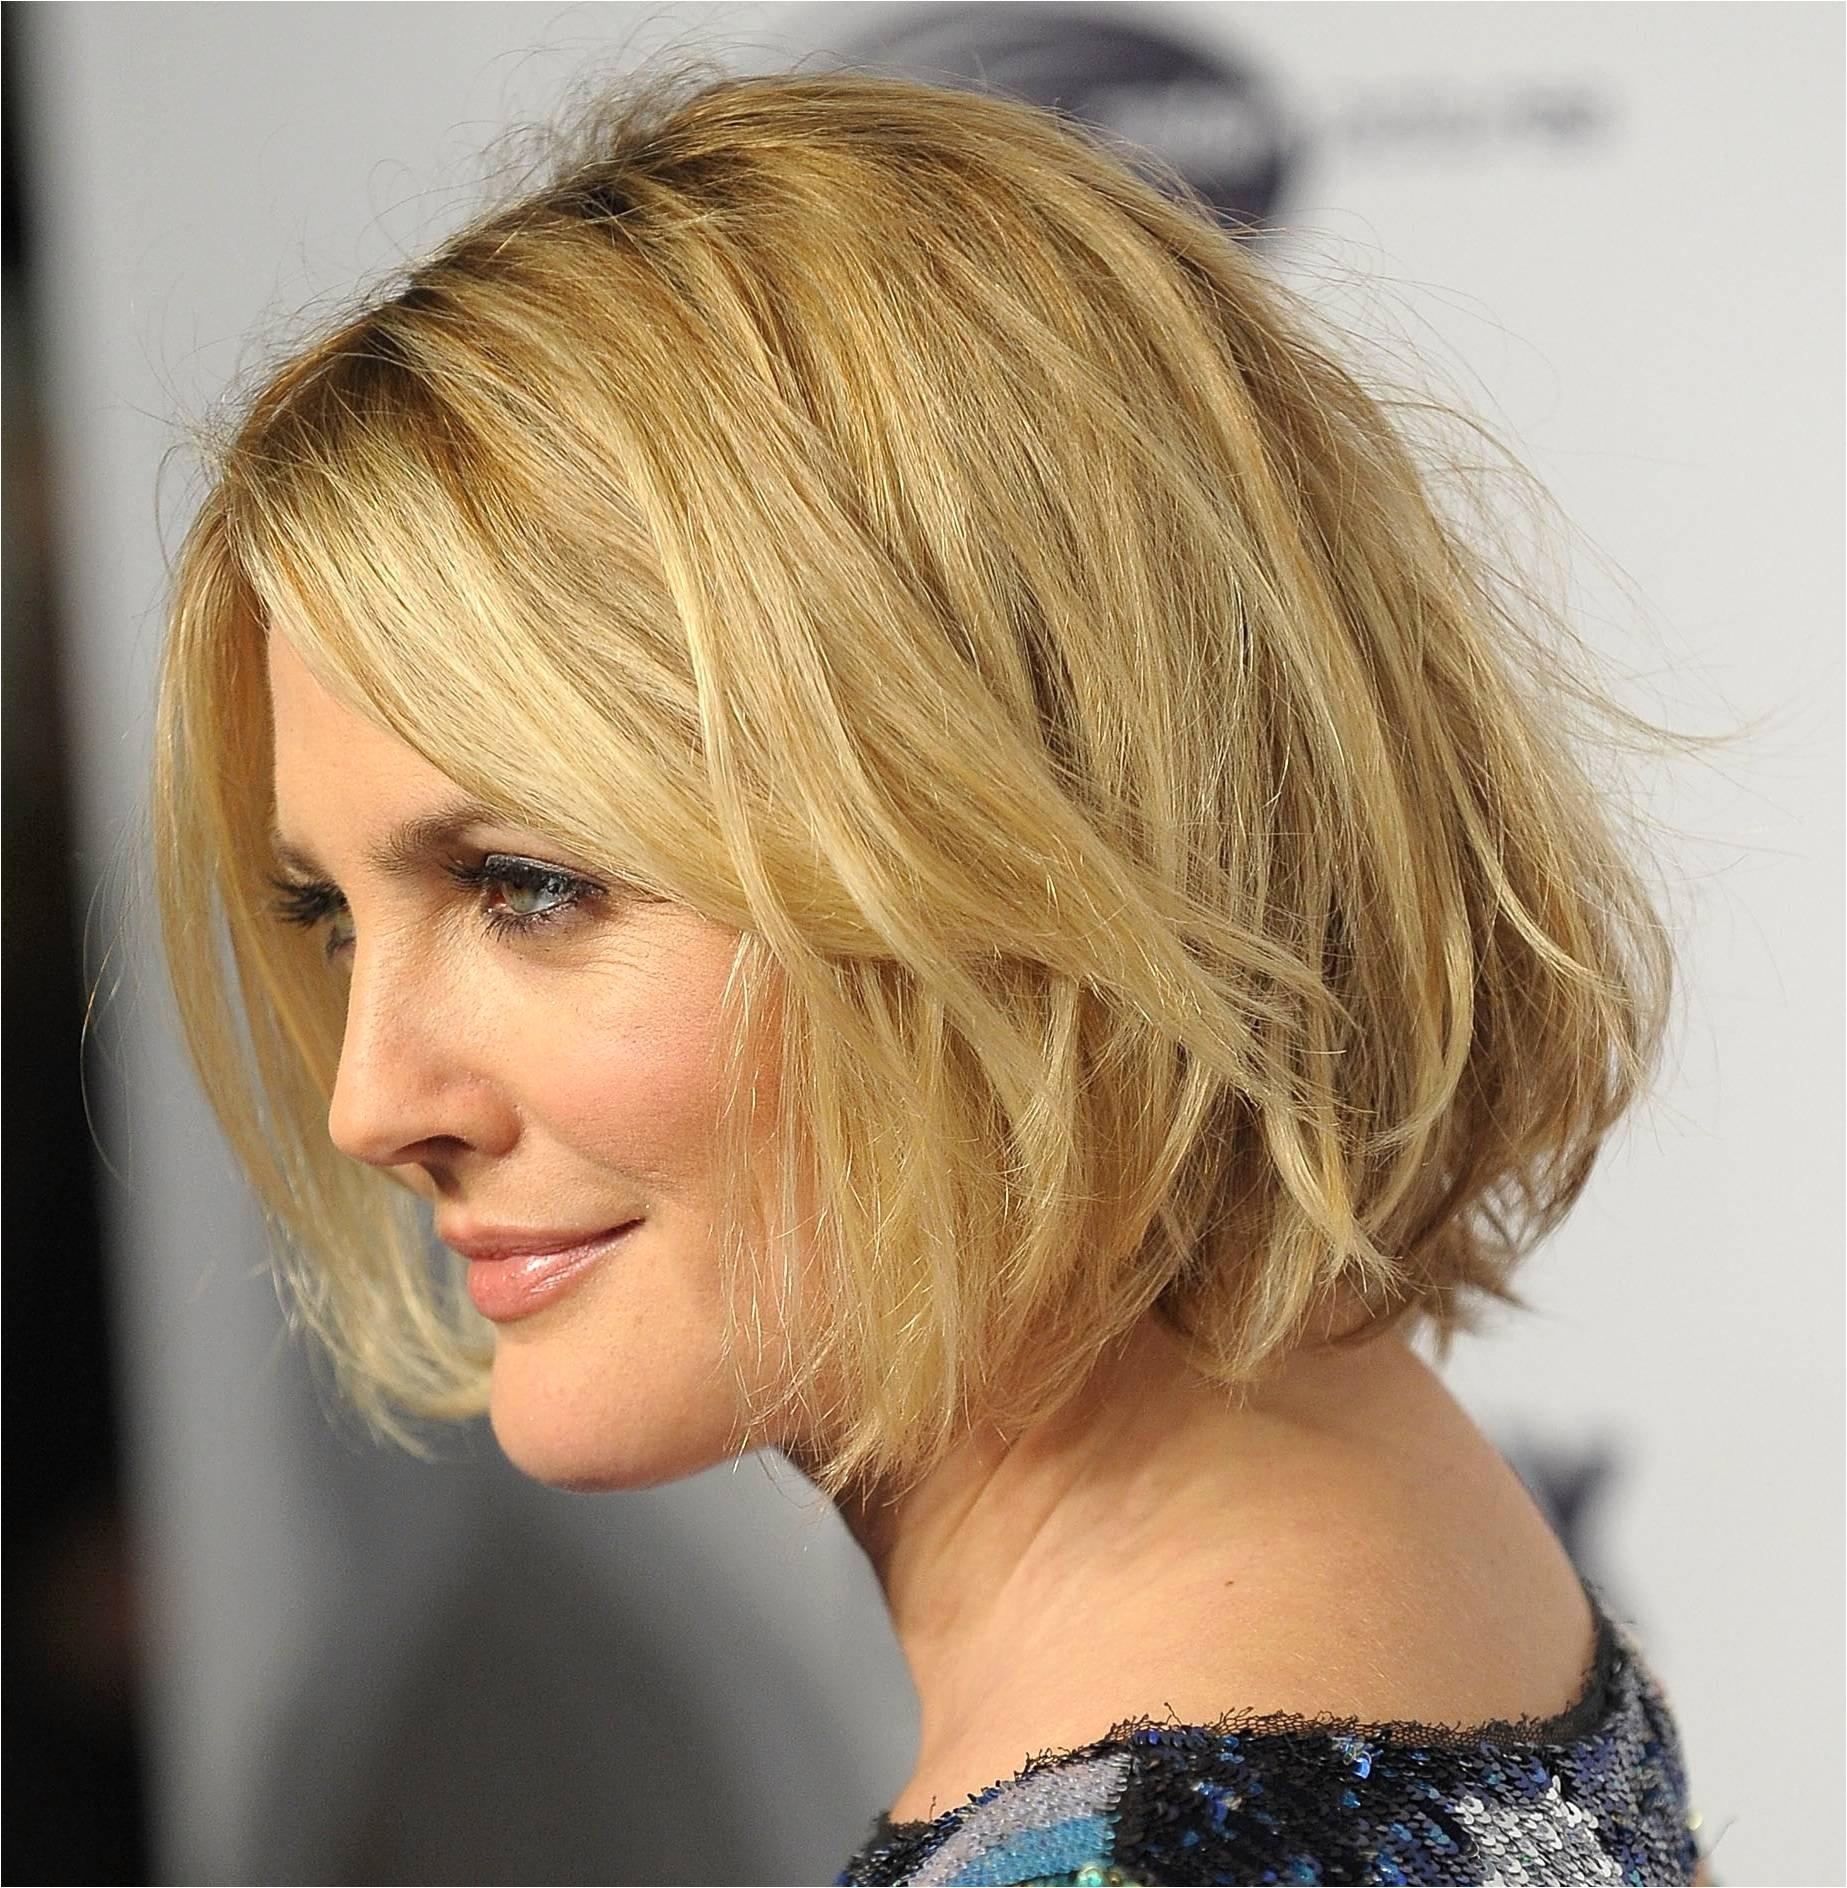 Cute Hairstyles for Medium Length Hair Luxury Best Layered Bob Hairstyles for Medium Length Hair